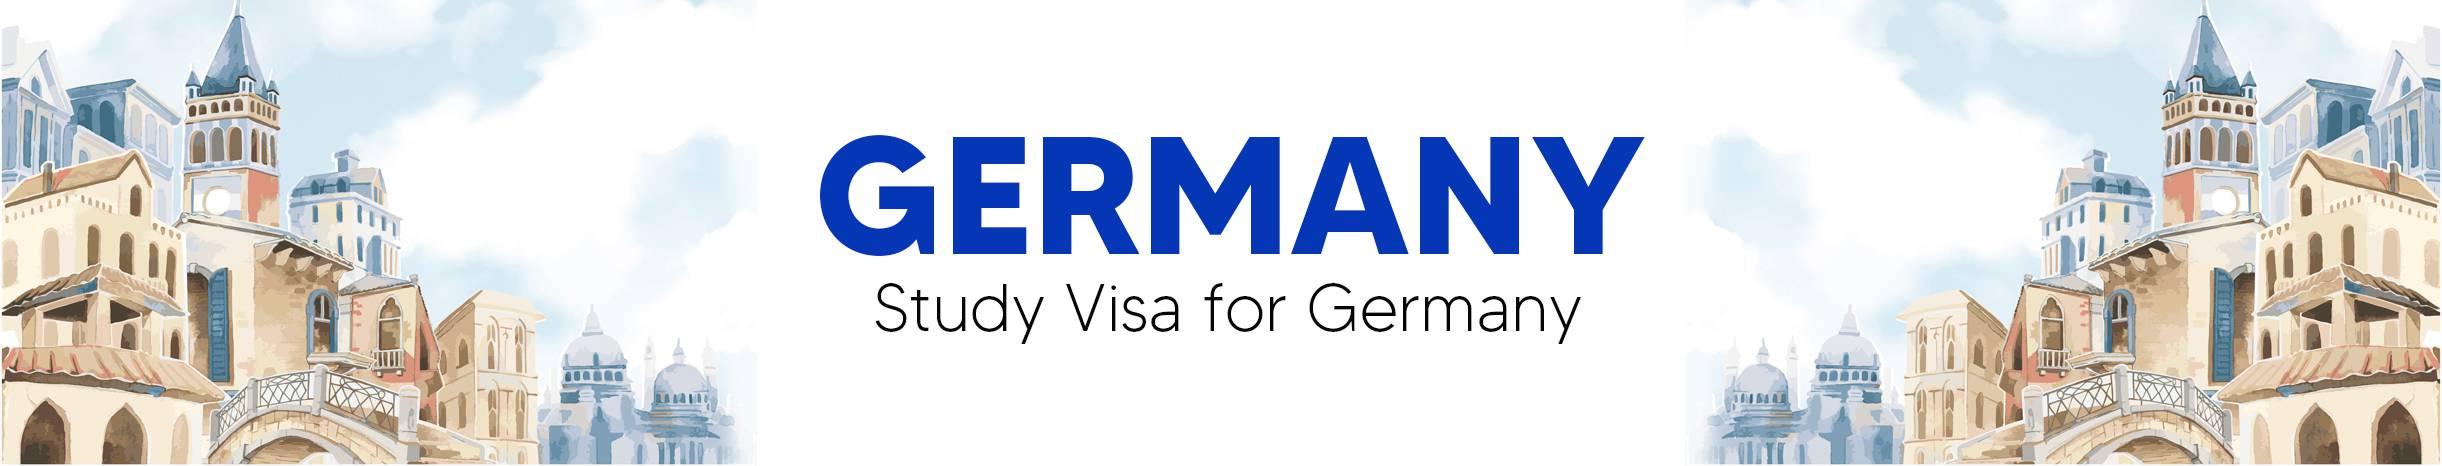 Student visa for Germany